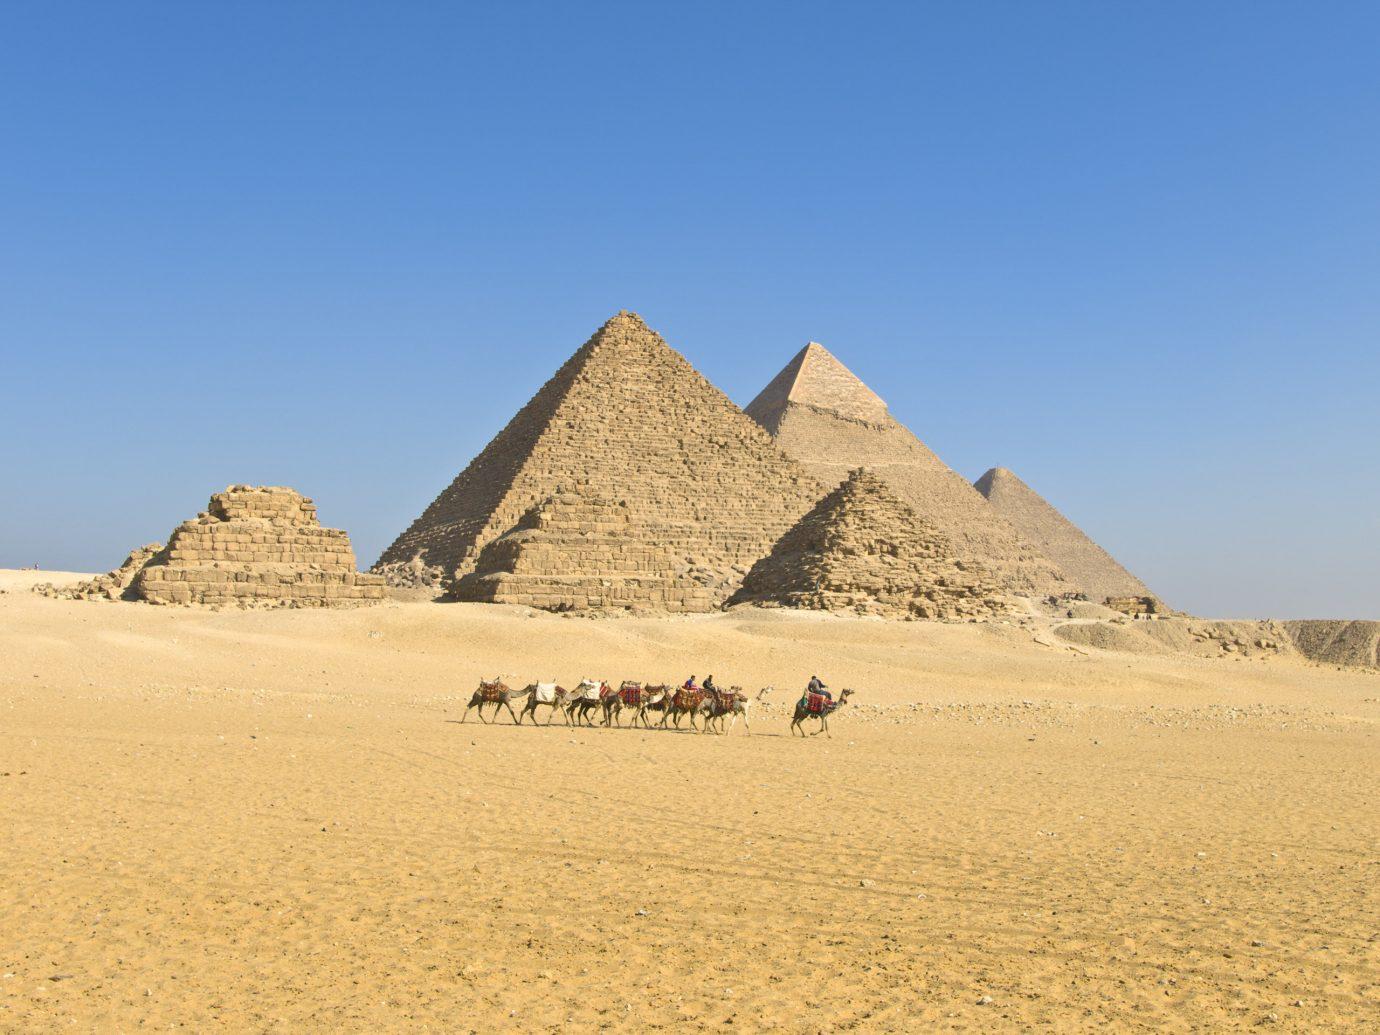 Hotels sky outdoor pyramid monument Nature ecosystem badlands landscape plateau wadi dune day sand highland